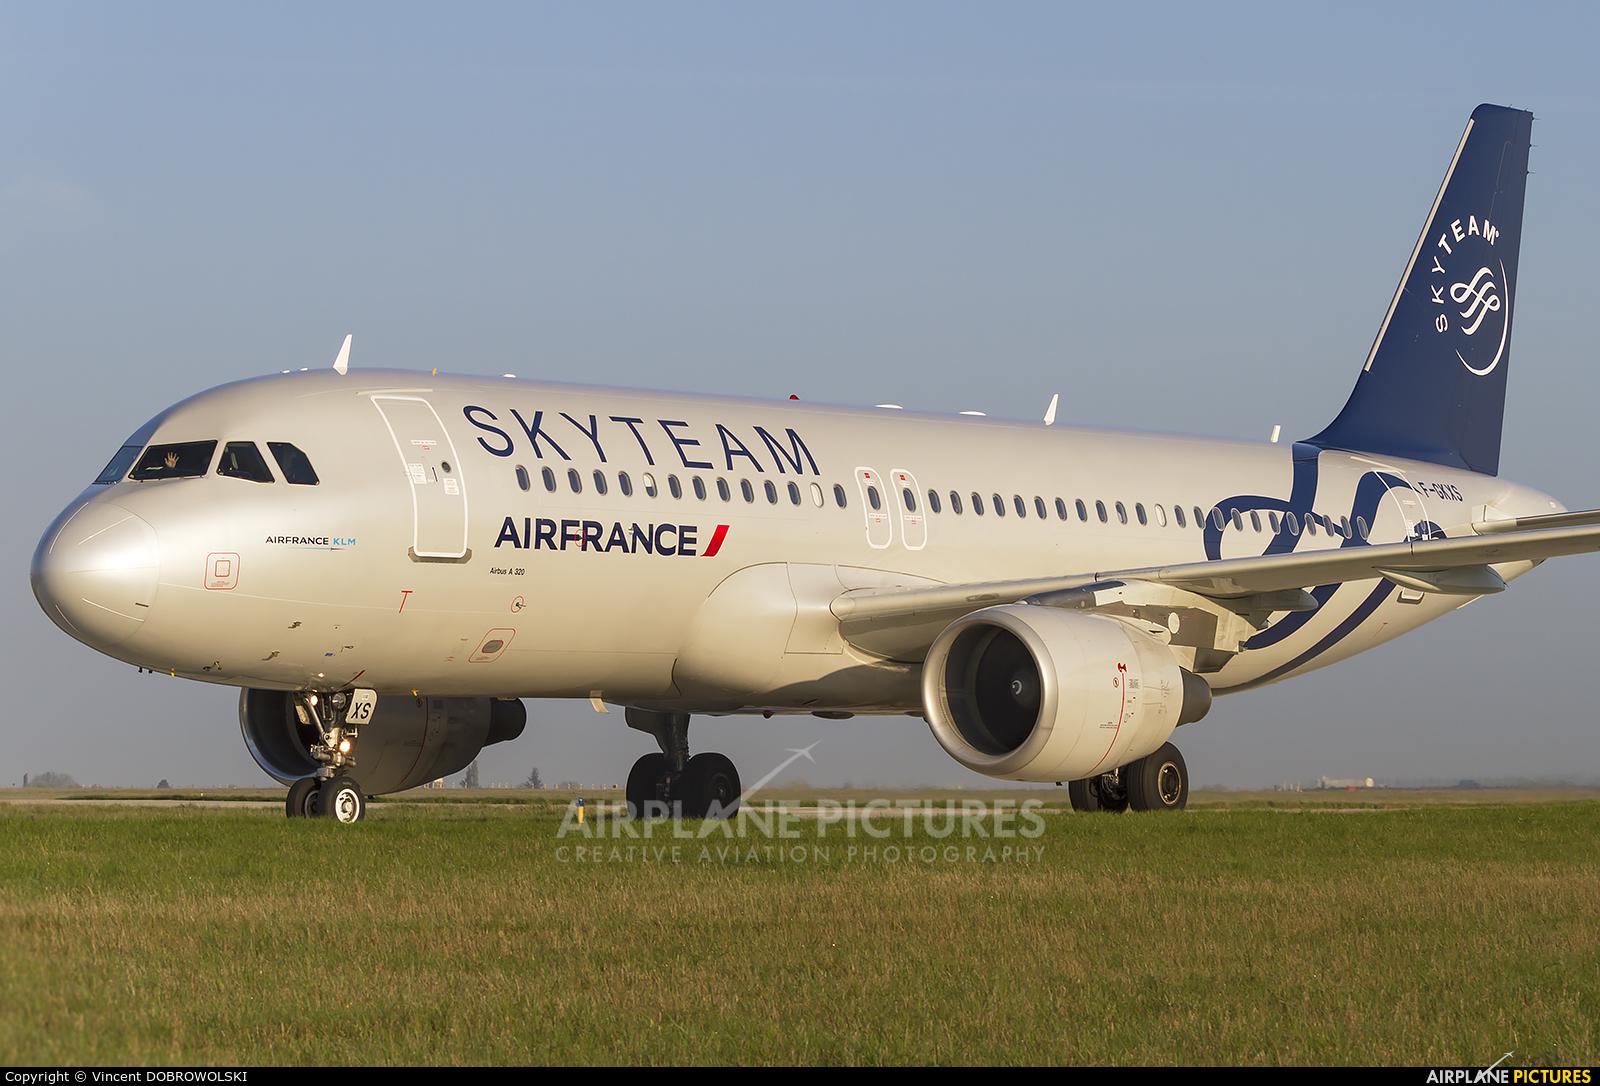 Air France F-GKXS aircraft at Paris - Charles de Gaulle